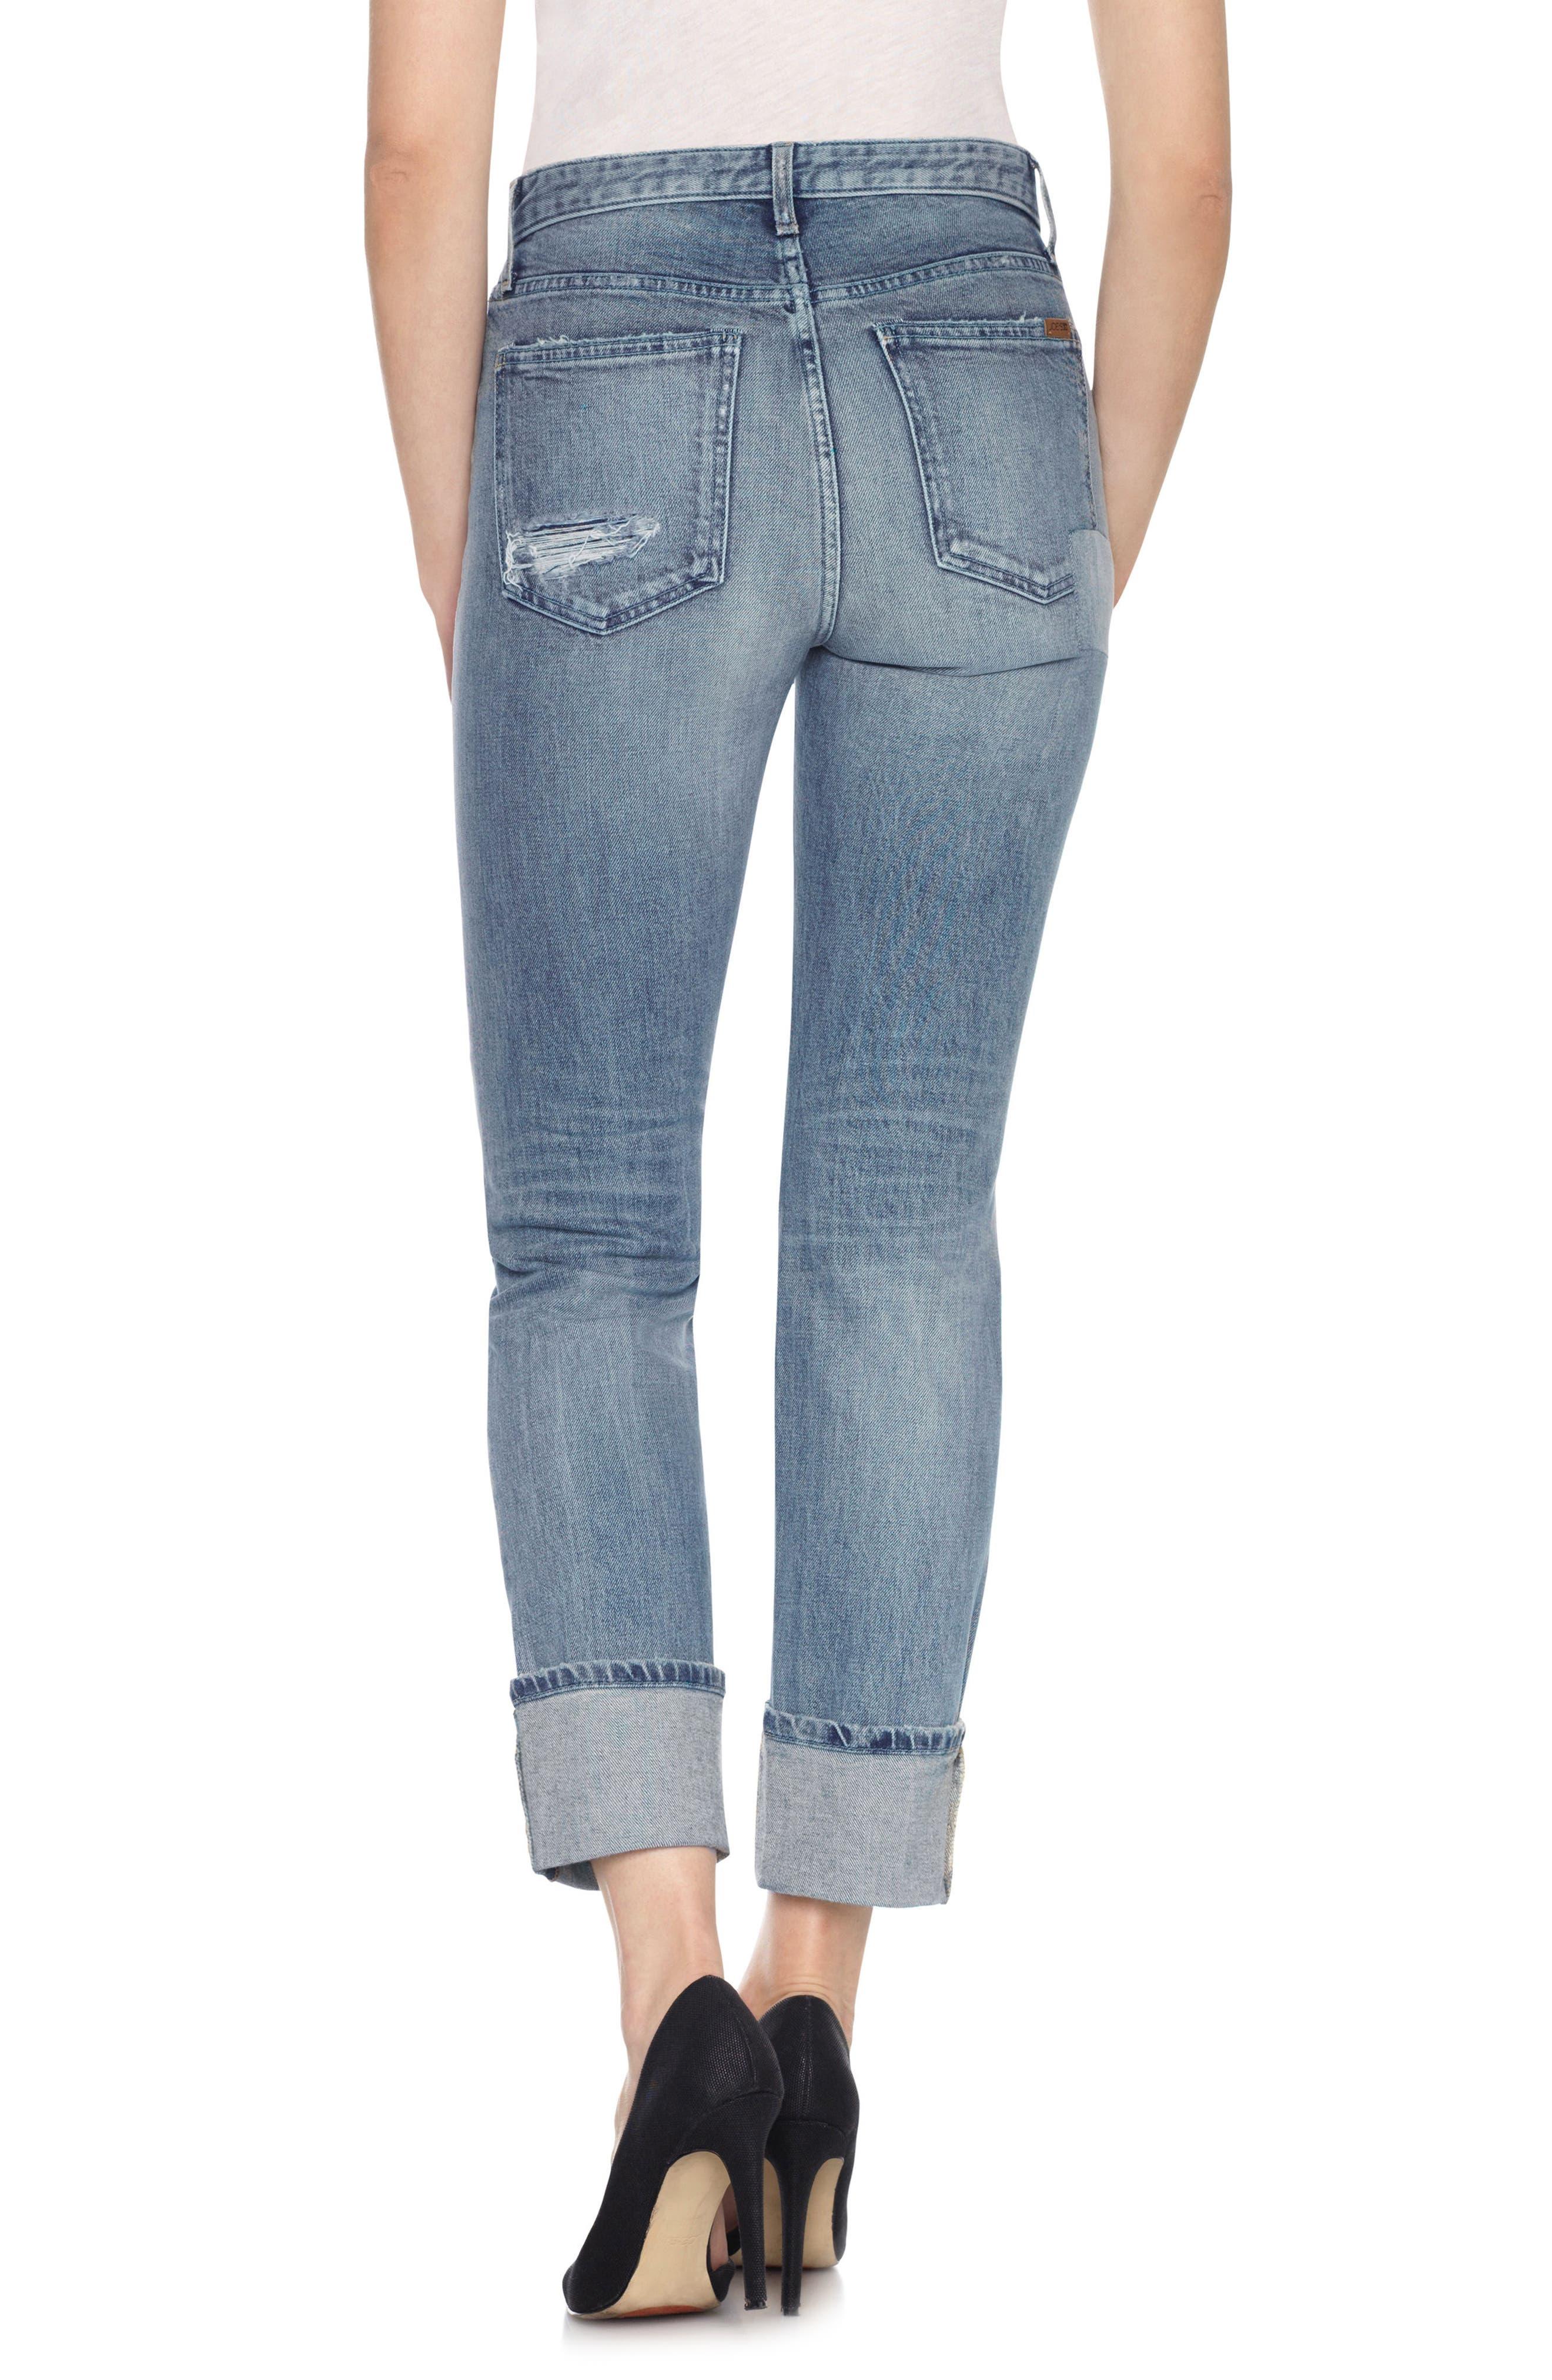 Taylor Hill x Joe's Debbie Cuff Straight Leg Jeans,                             Alternate thumbnail 2, color,                             430